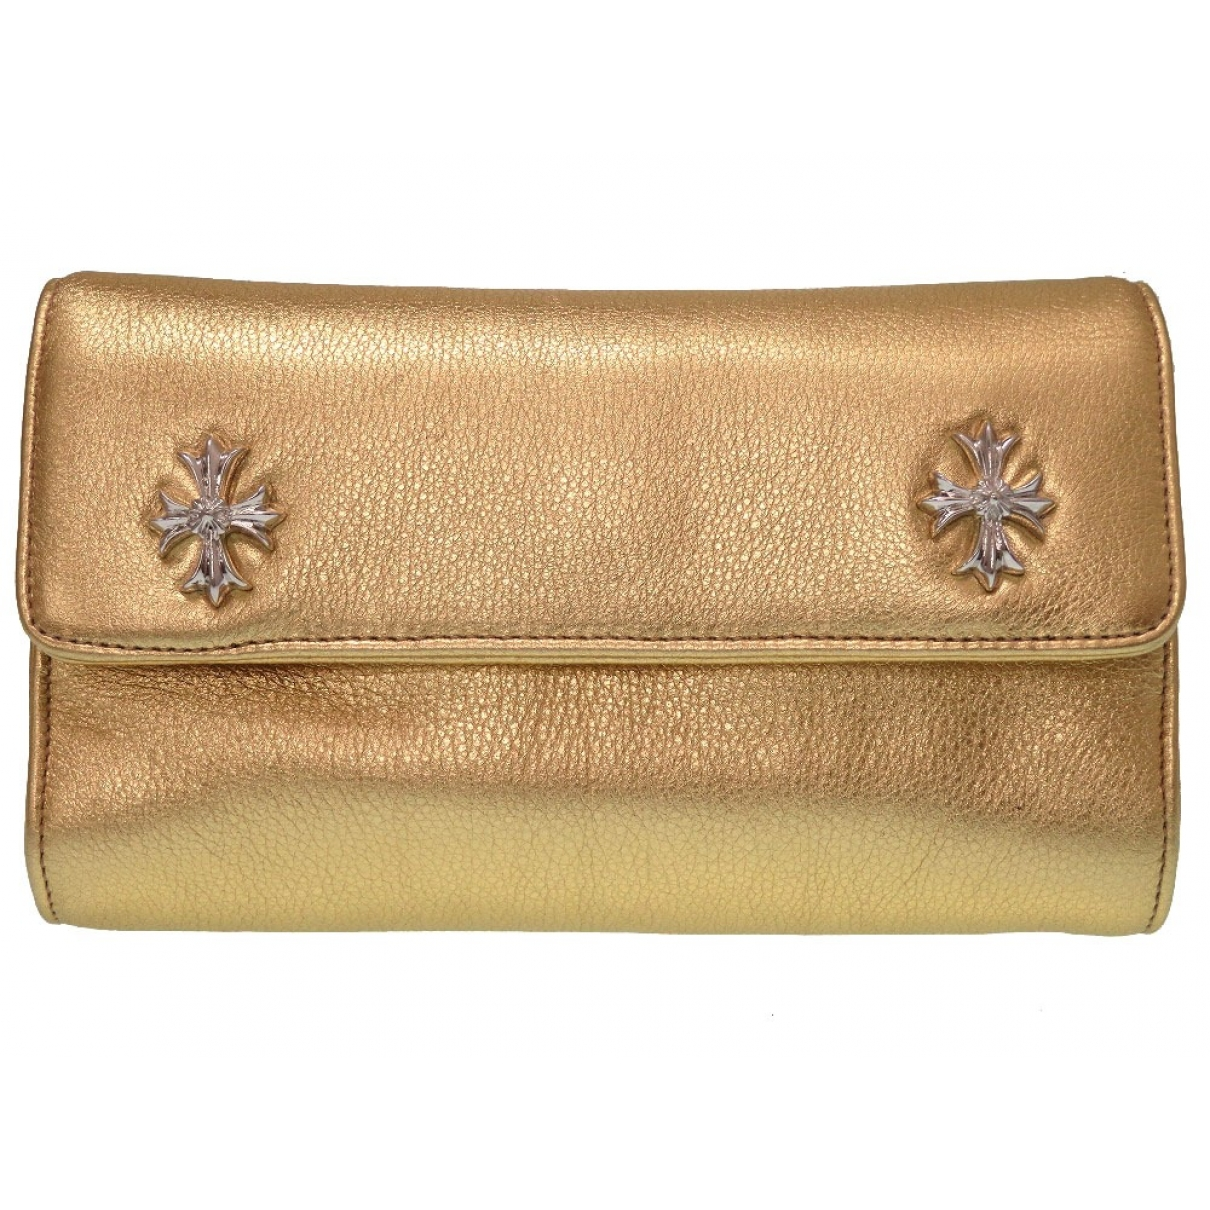 Chrome Hearts \N Gold Leather Clutch bag for Women \N